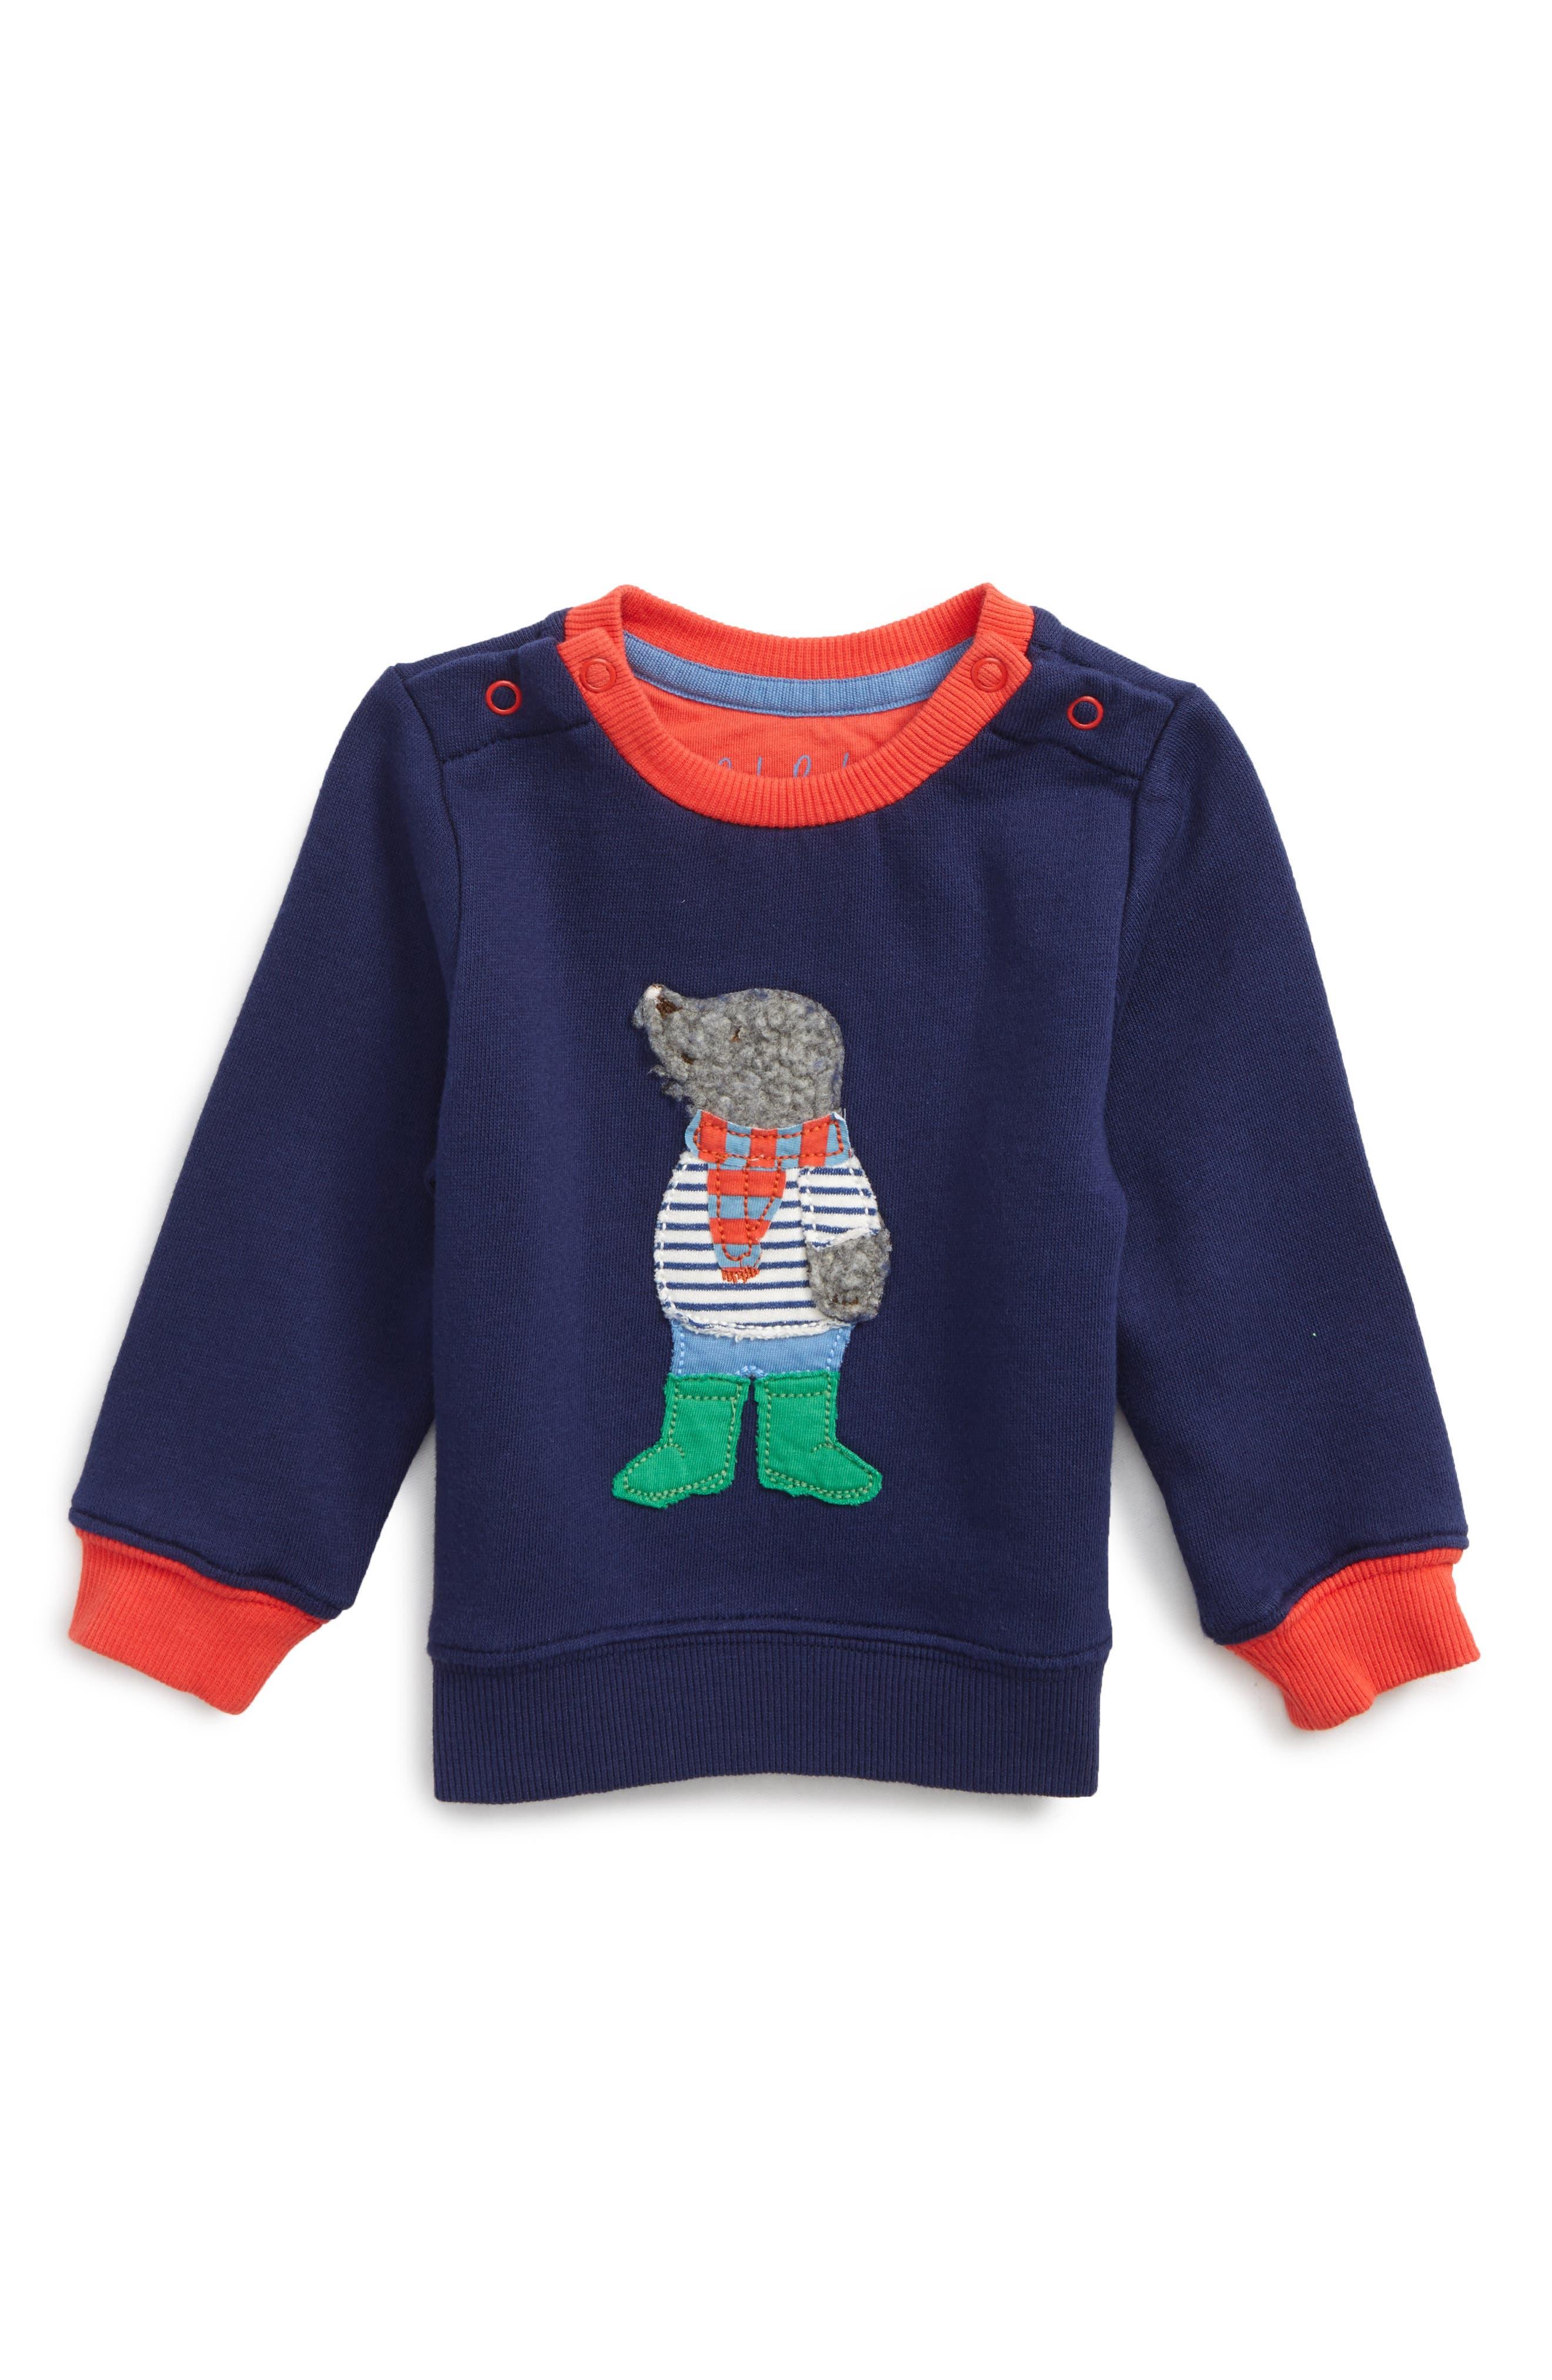 Main Image - Mini Boden Appliqué Cozy Sweatshirt (Baby Boys & Toddler Boys)